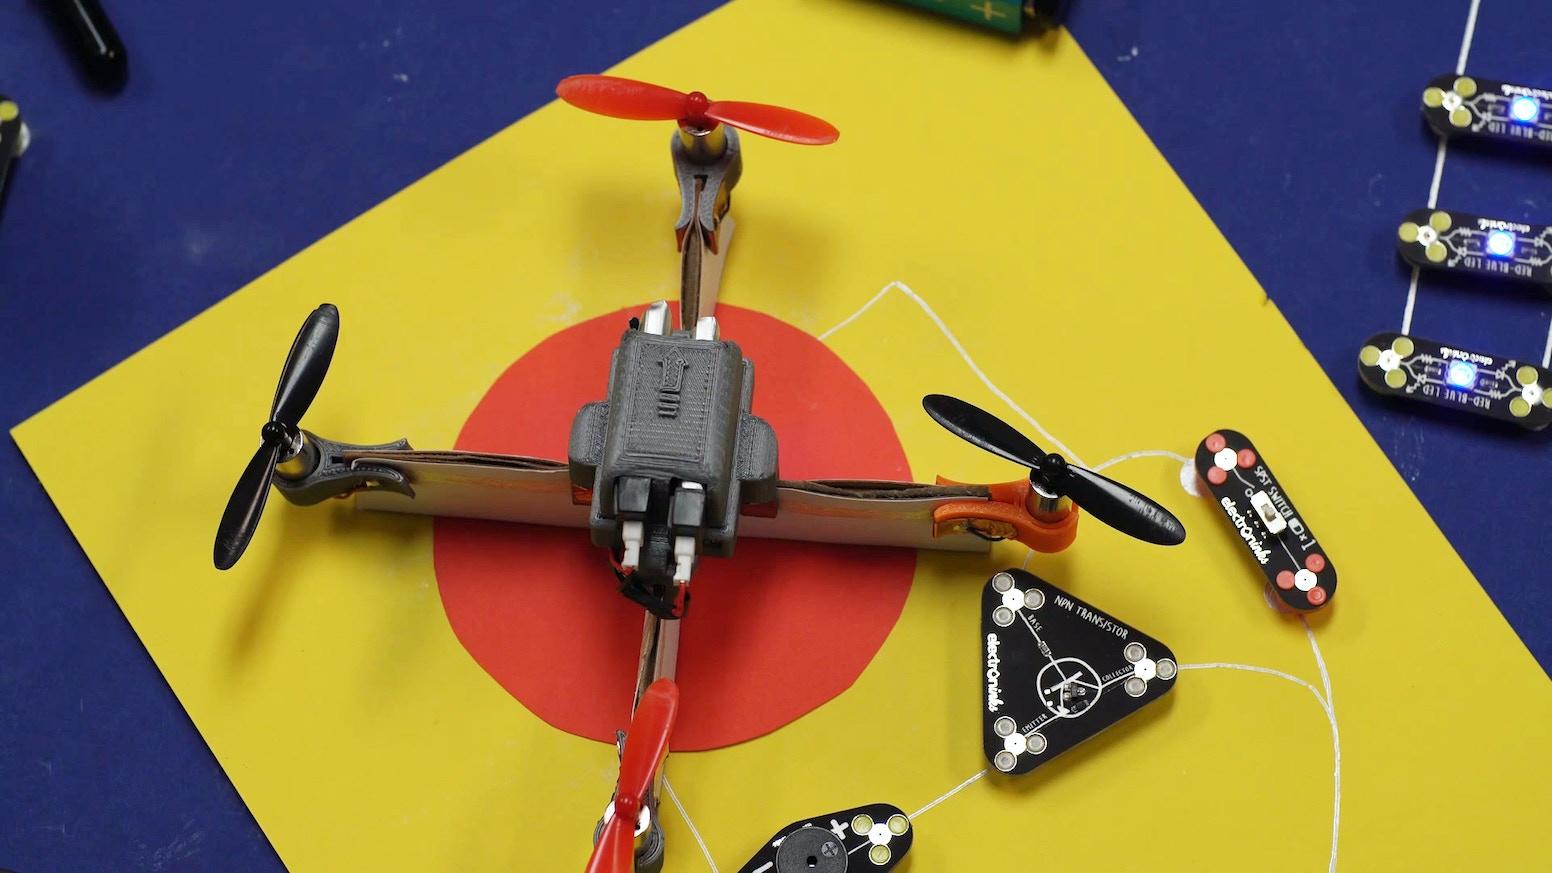 Circuit Scribe: DIY Electronic Kits by Electroninks